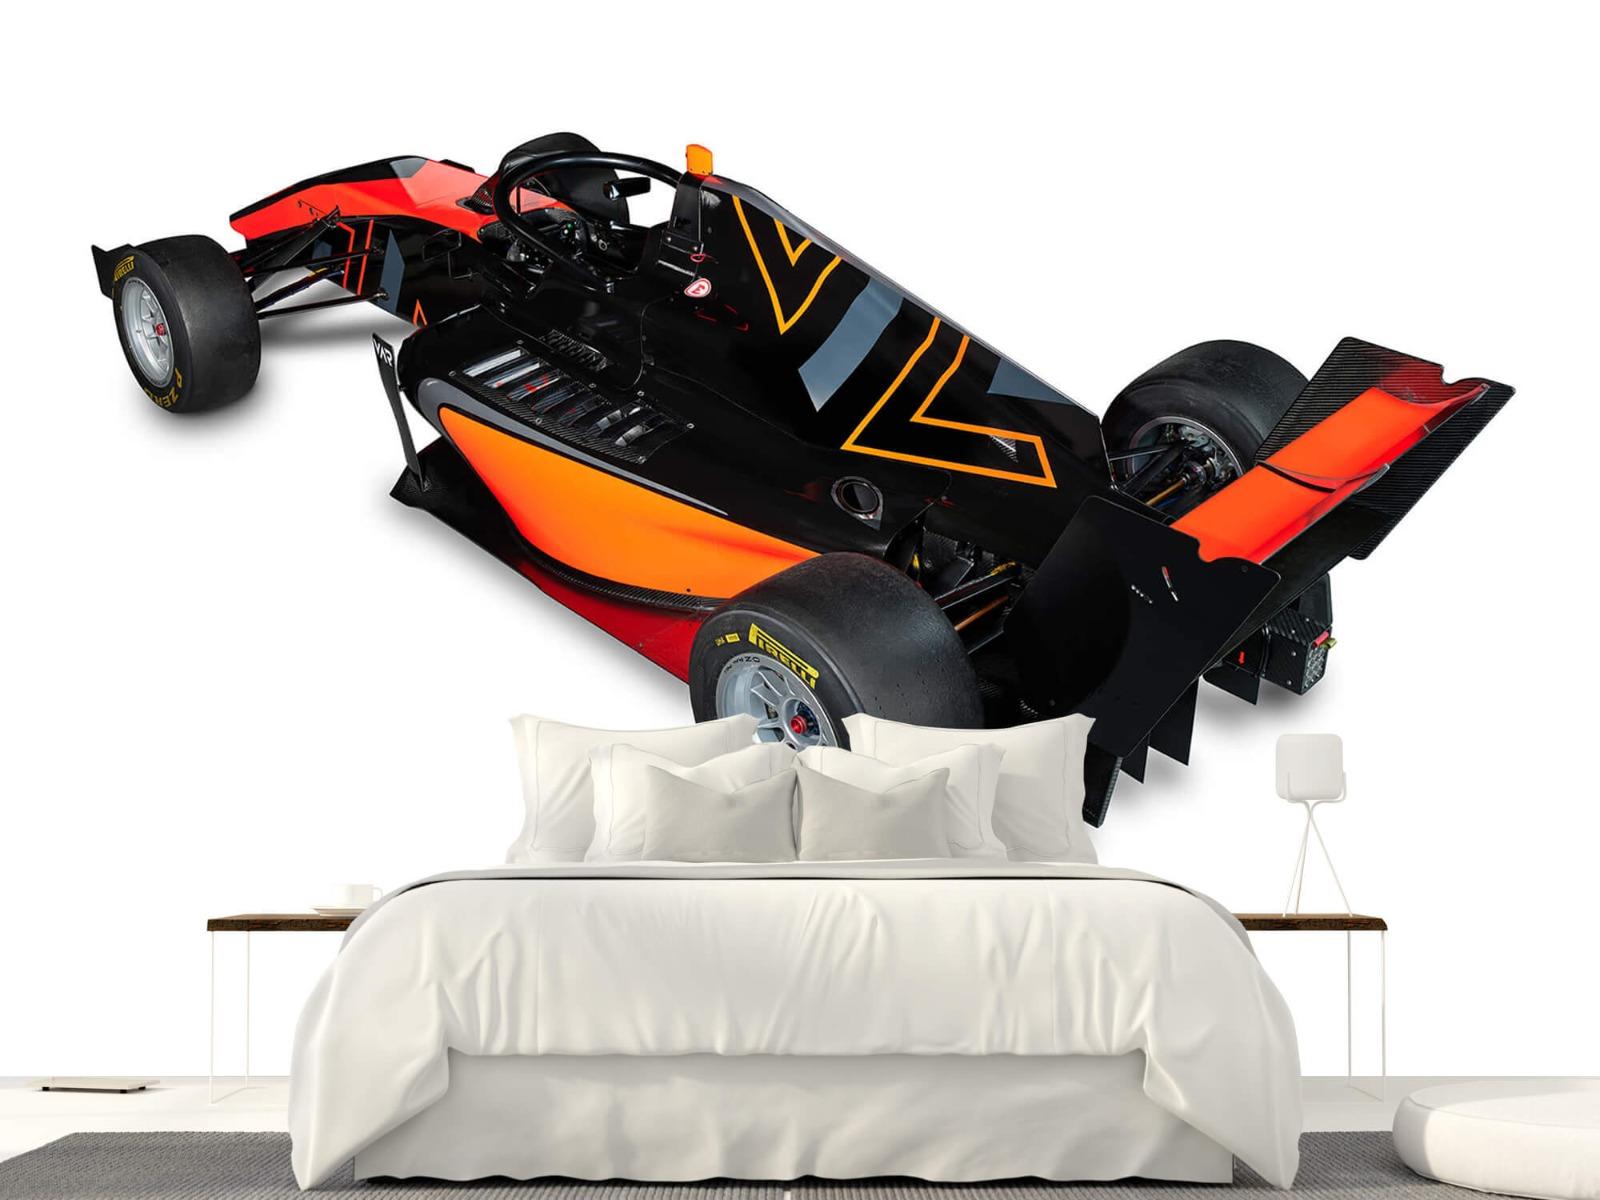 Sportauto's - Formula 3 - Rear left view - Hobbykamer 23